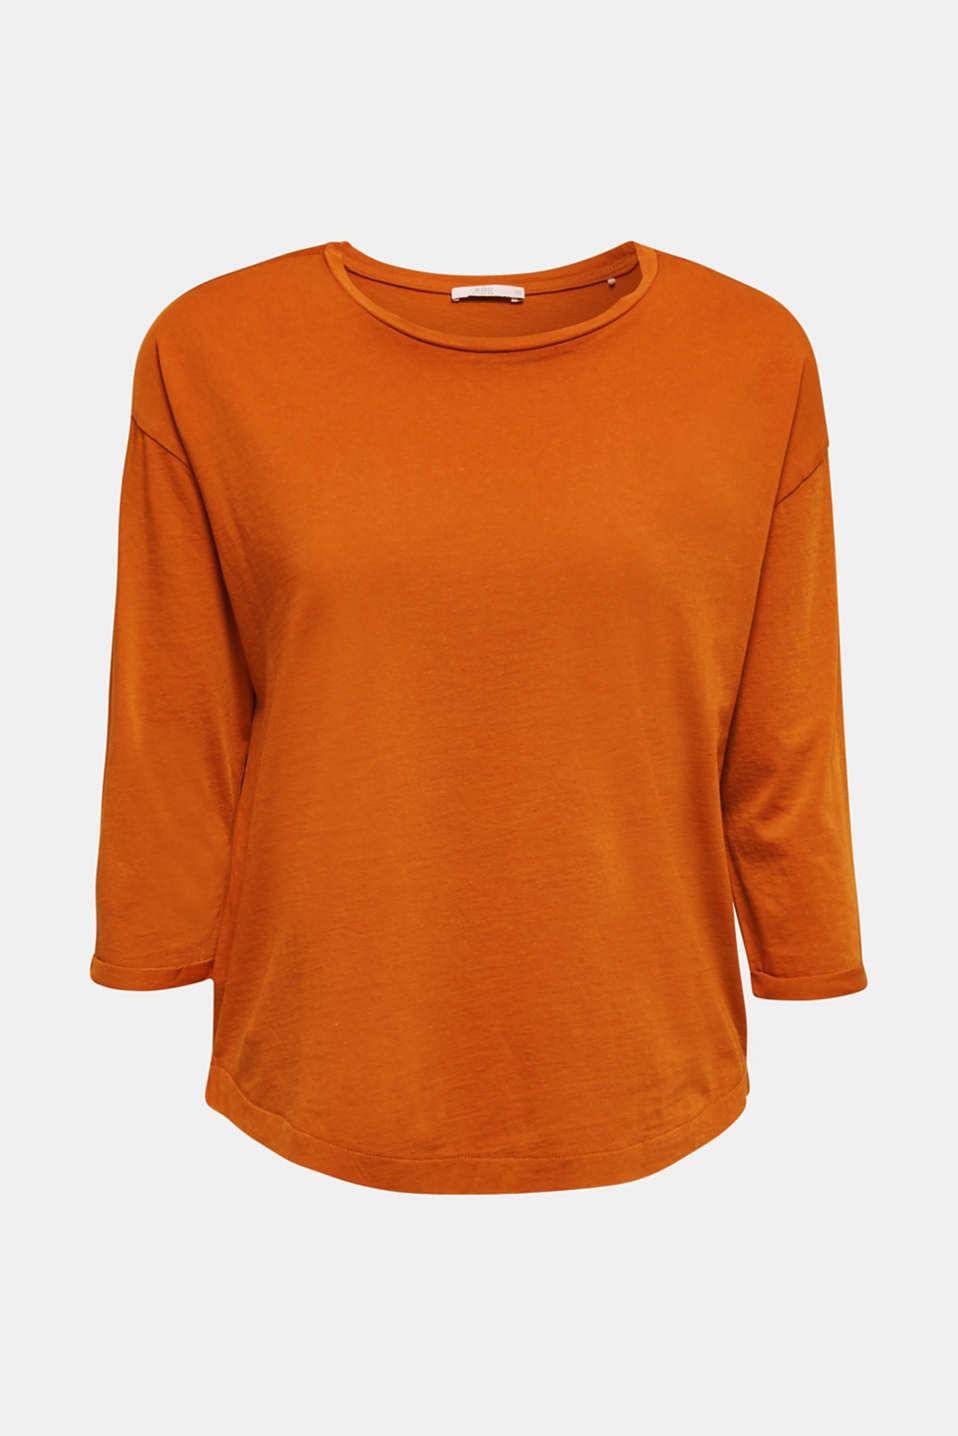 T-Shirts, CINNAMON 4, detail image number 6